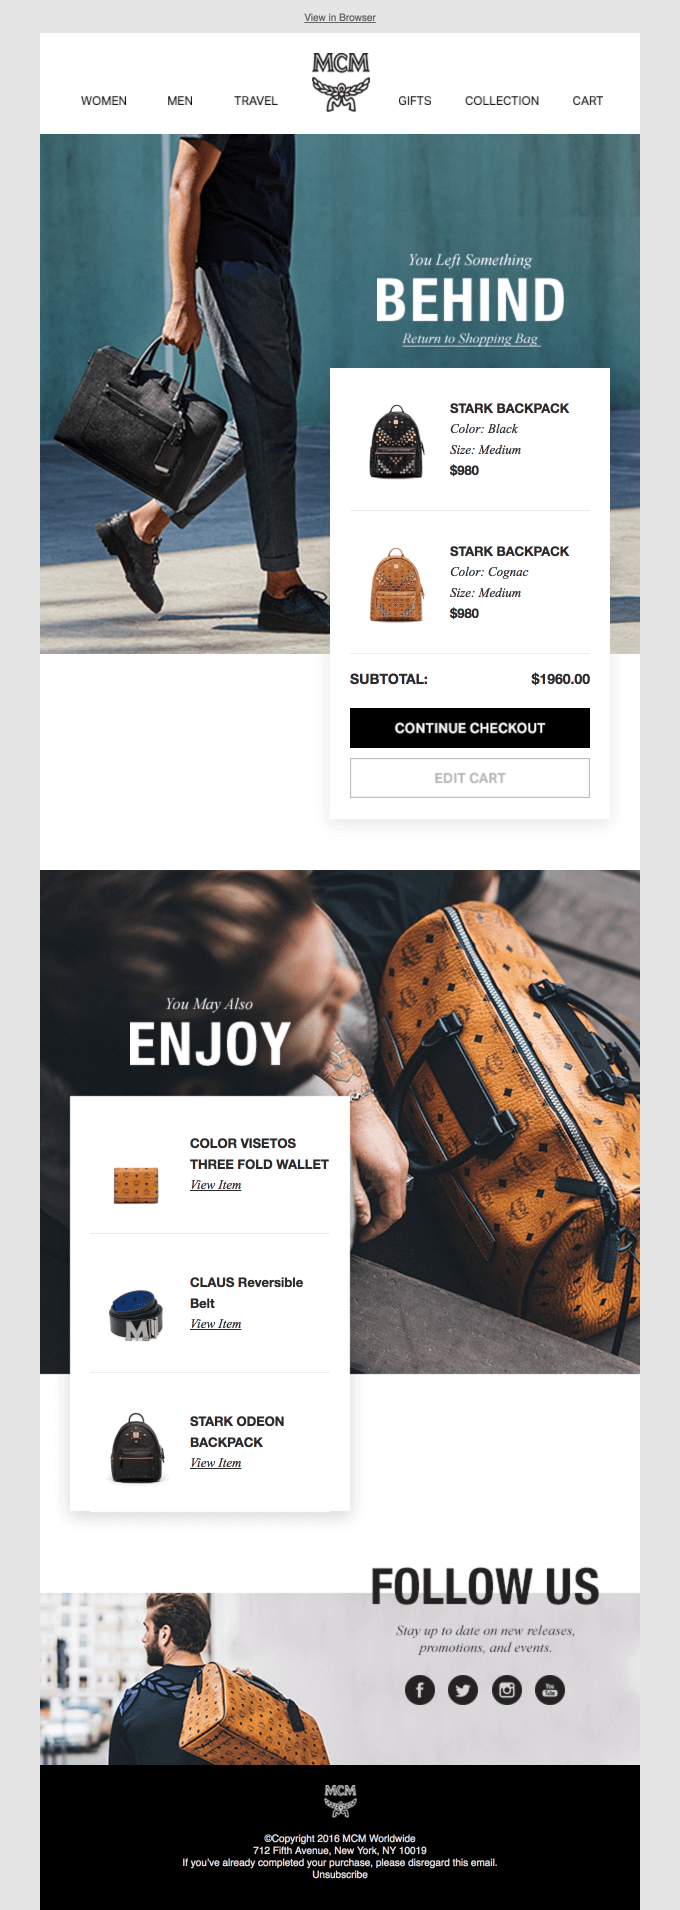 MCM abandoned cart email